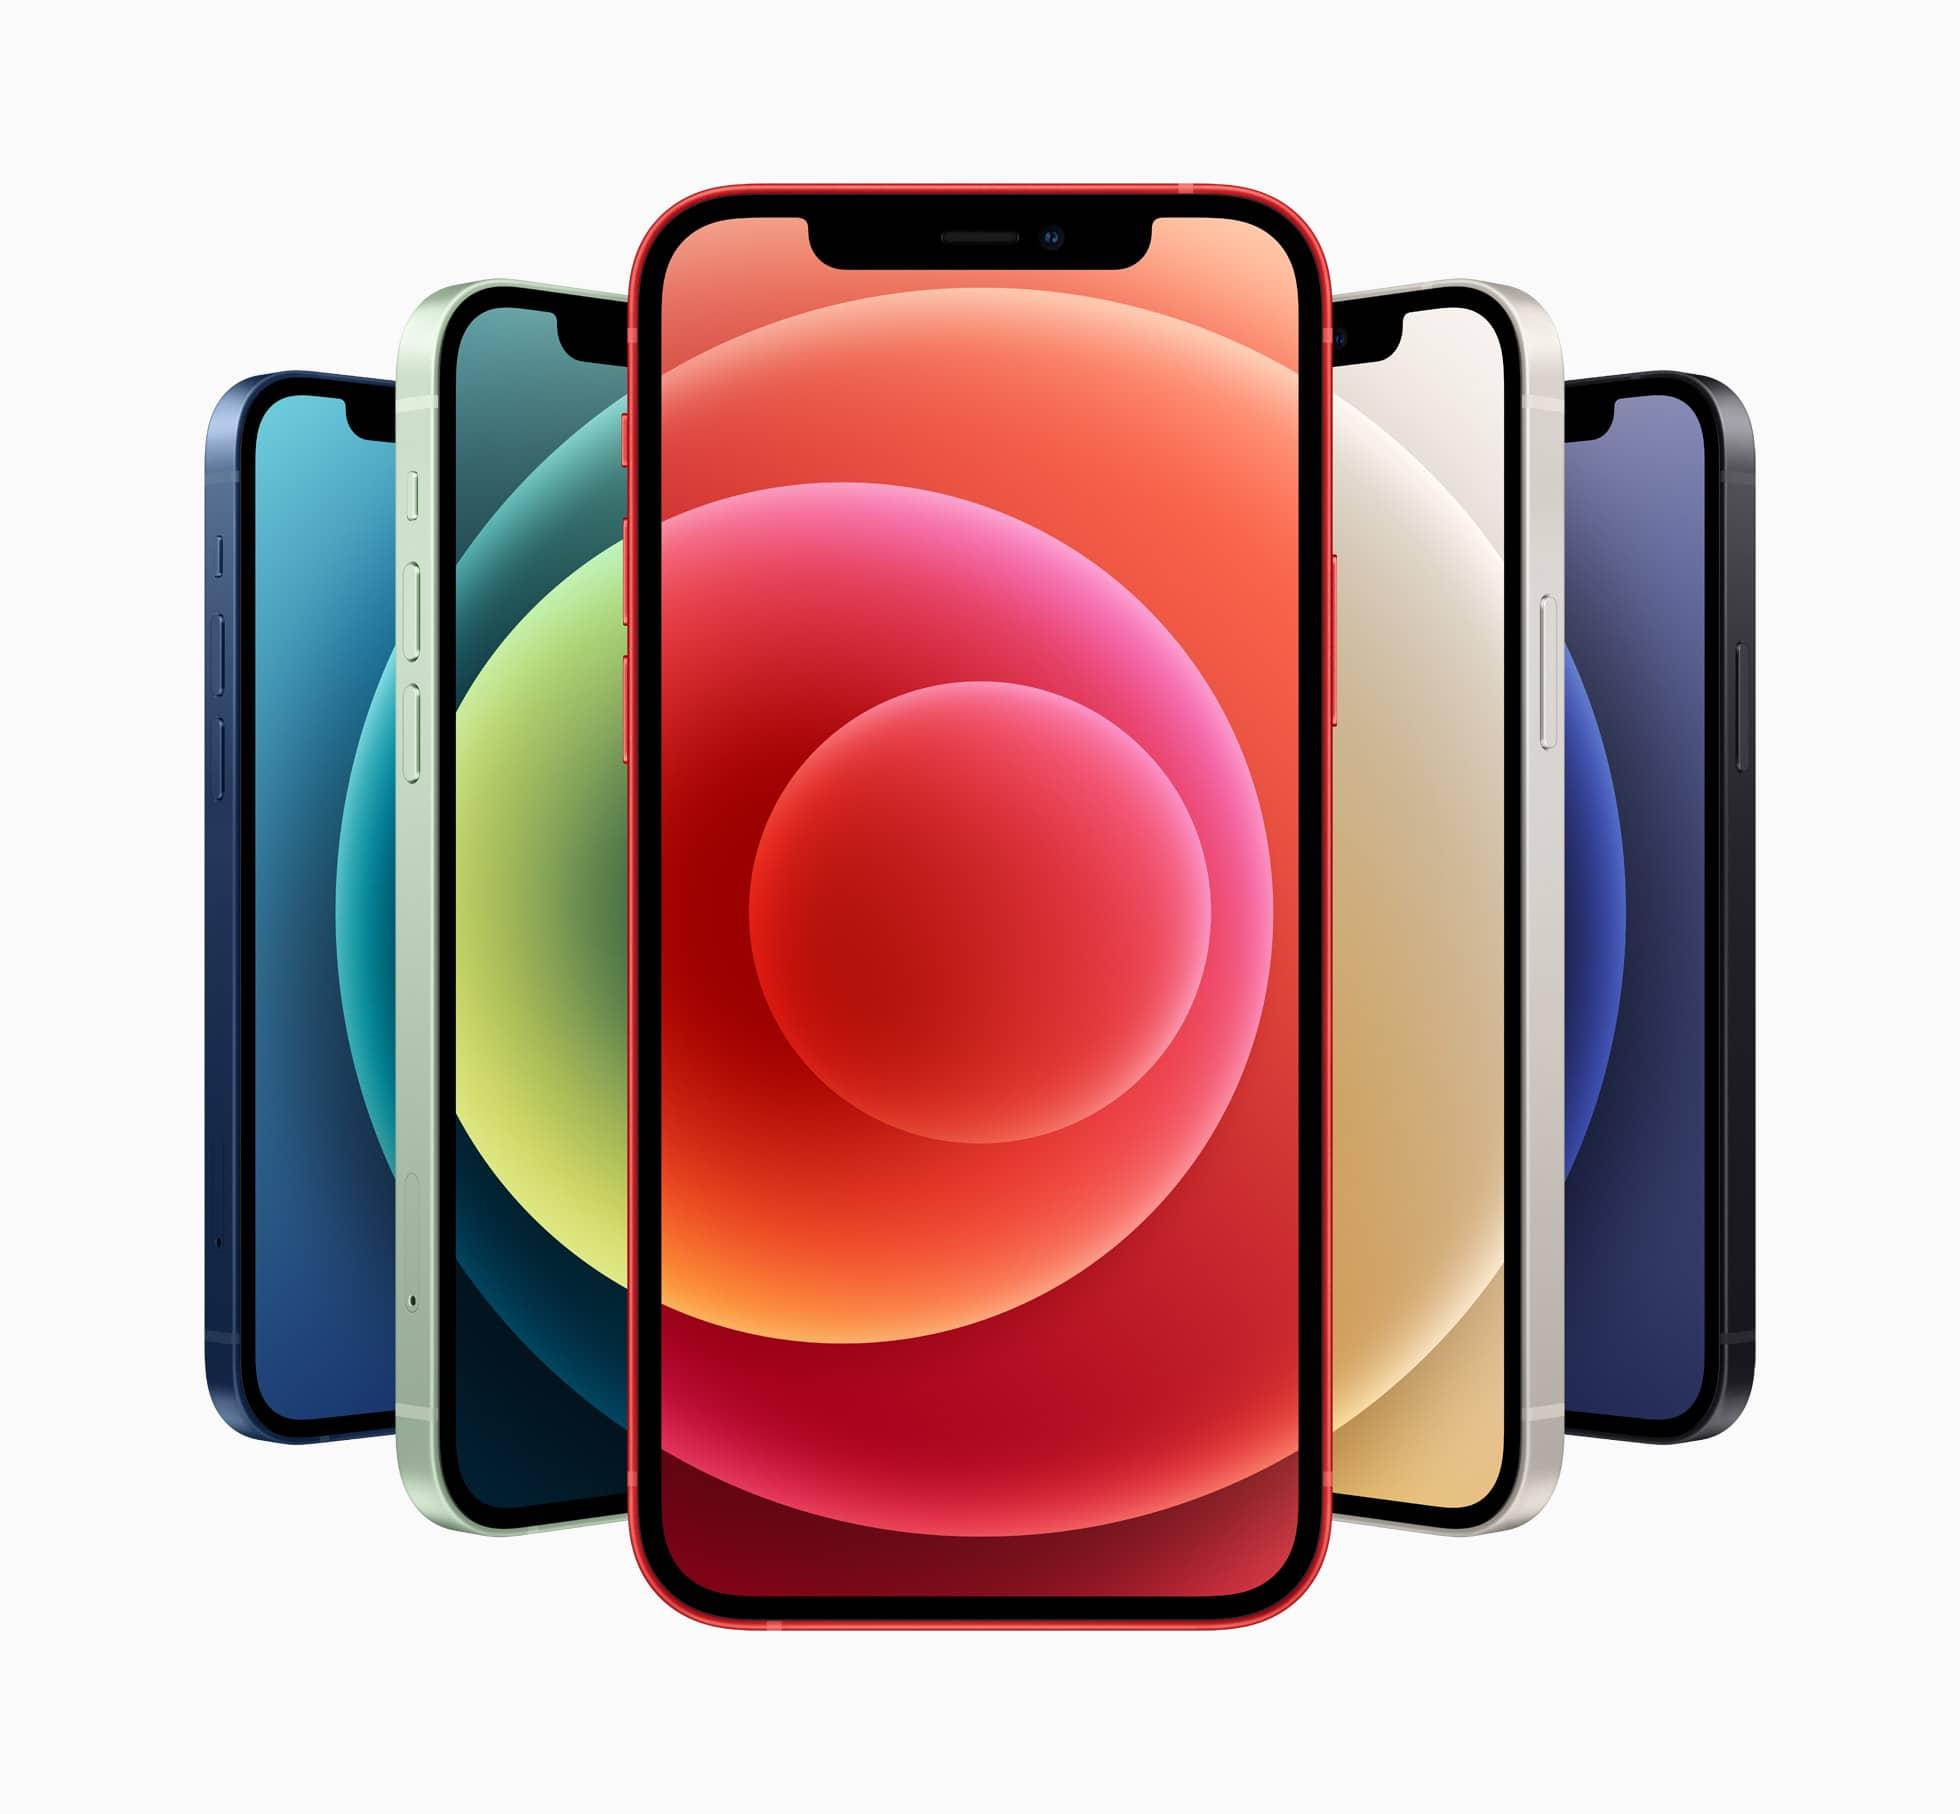 apple iphone 12 new design geo 10132020